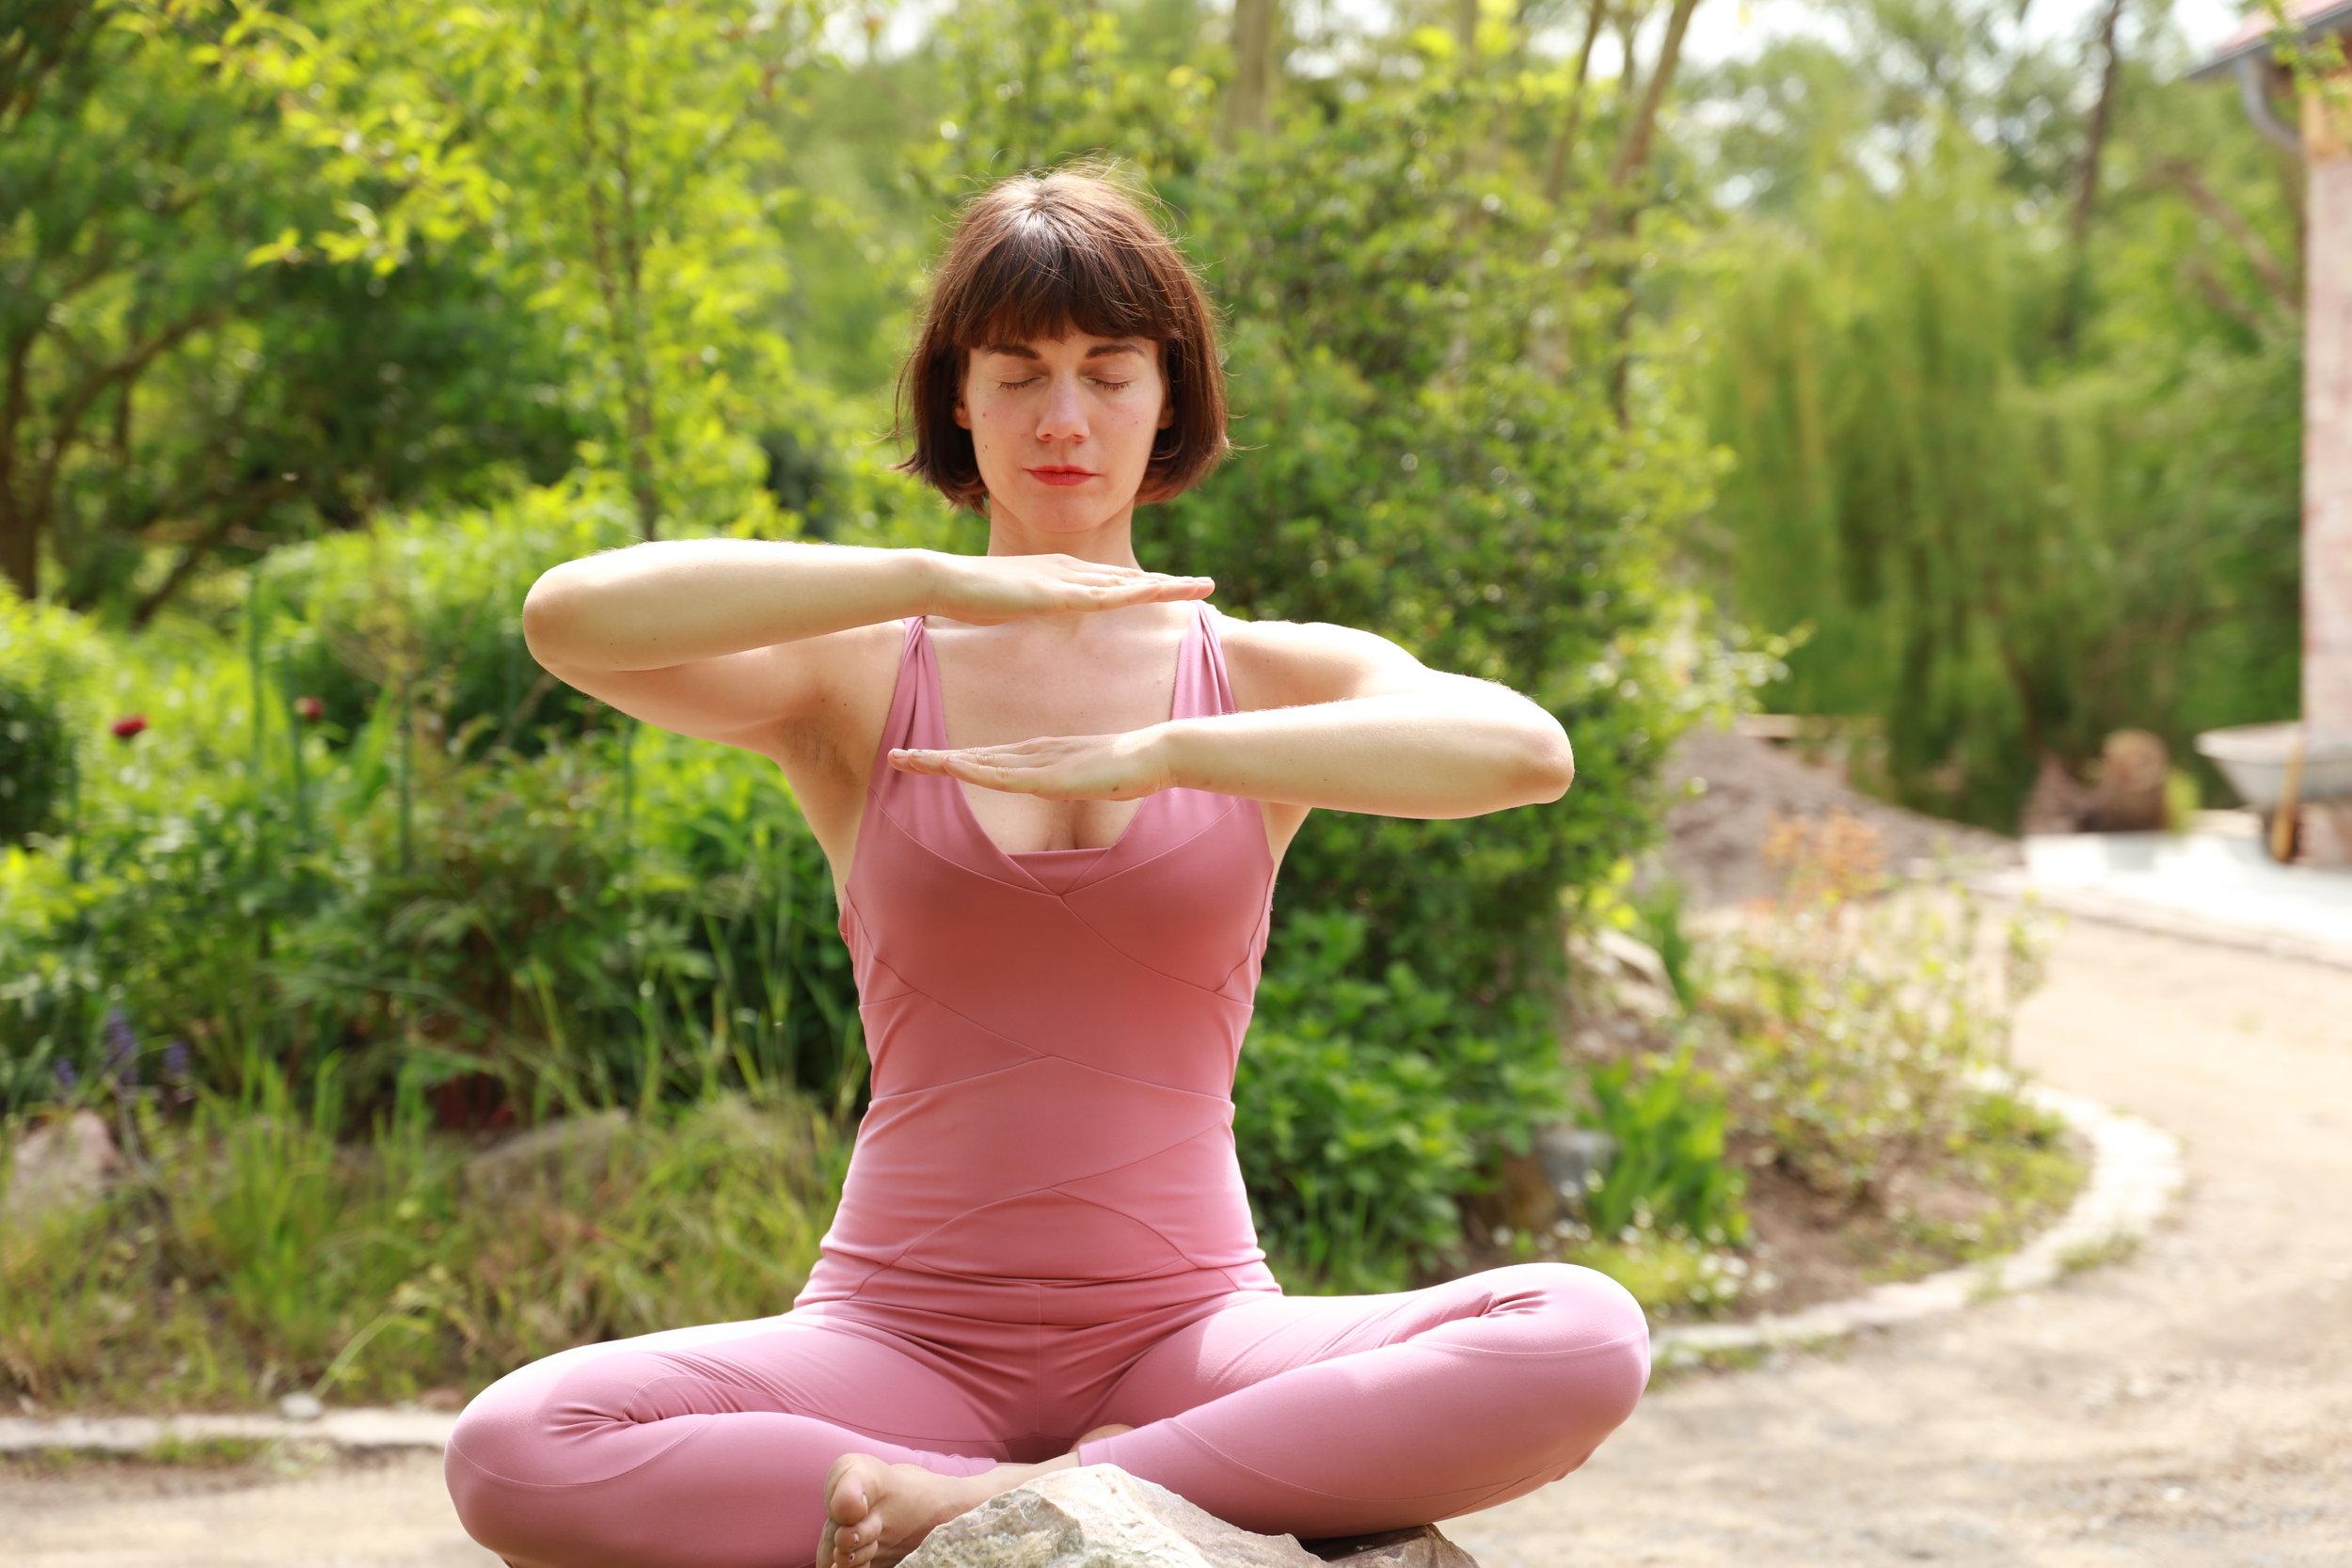 Stundenplan - Offene KlassenDIENSTAG16.30 - 17.30 Vinyasa, all levelyogafürdich am SüdsternMITTWOCH, 14.8. -25.9.1920.15 - 21.30 Chakra StudiesHatha/ Kundalini/ Yin - wechselndPraxis in der RemiseOhlauer Straße 10 ,10999 B.Drop in 12€ & USC M,LFREITAG ab 16.8.198.00 -9.00 UhrKundalini Yoga, all levelKreuzbergyogaLübberstraße 9, 10997 B.Drop in 12€ & USC M,LSONNTAG10.15 -11.45 Vinyasa, all levelYellow Yoga Sonne